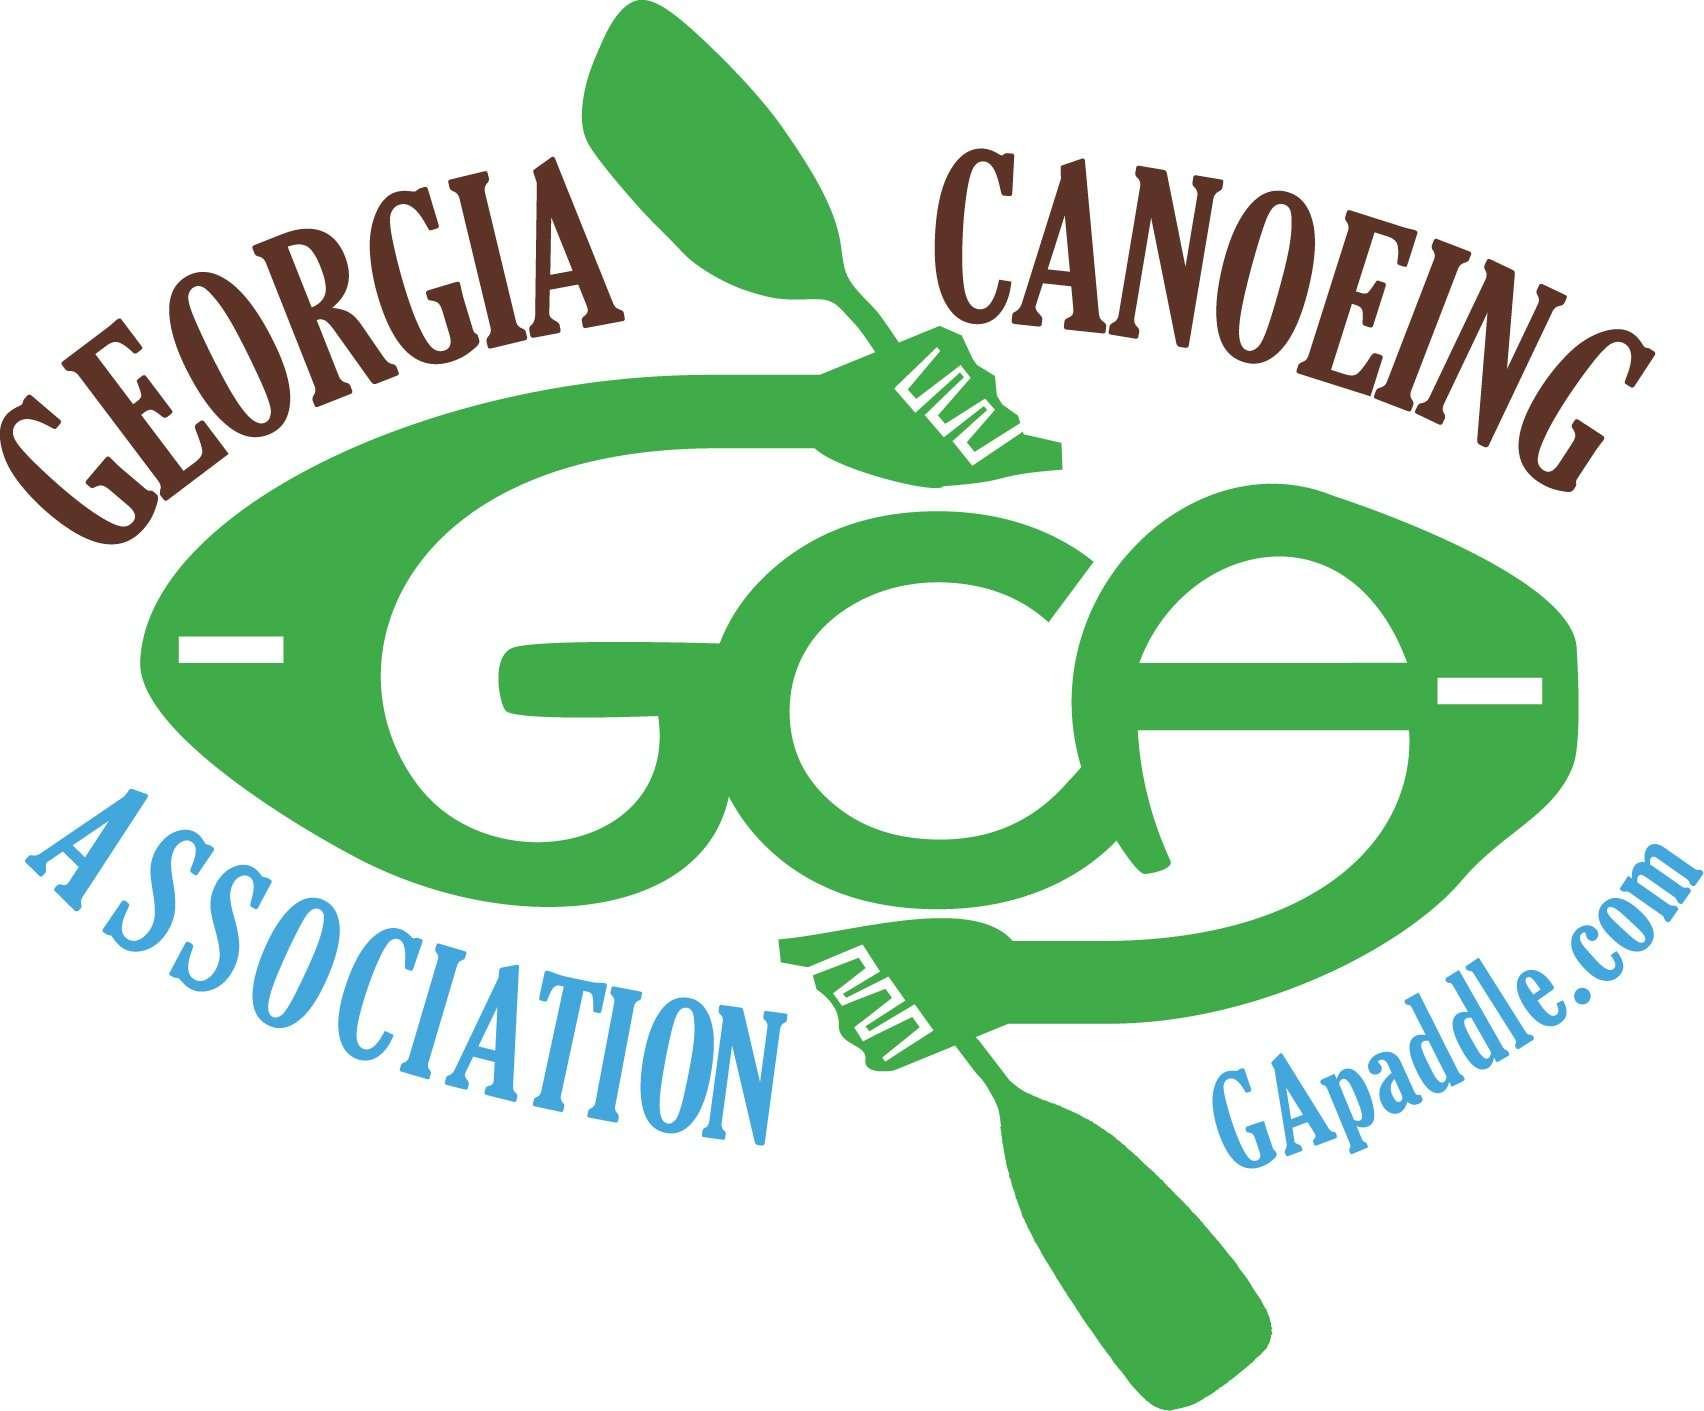 Georgia Canoeing Association